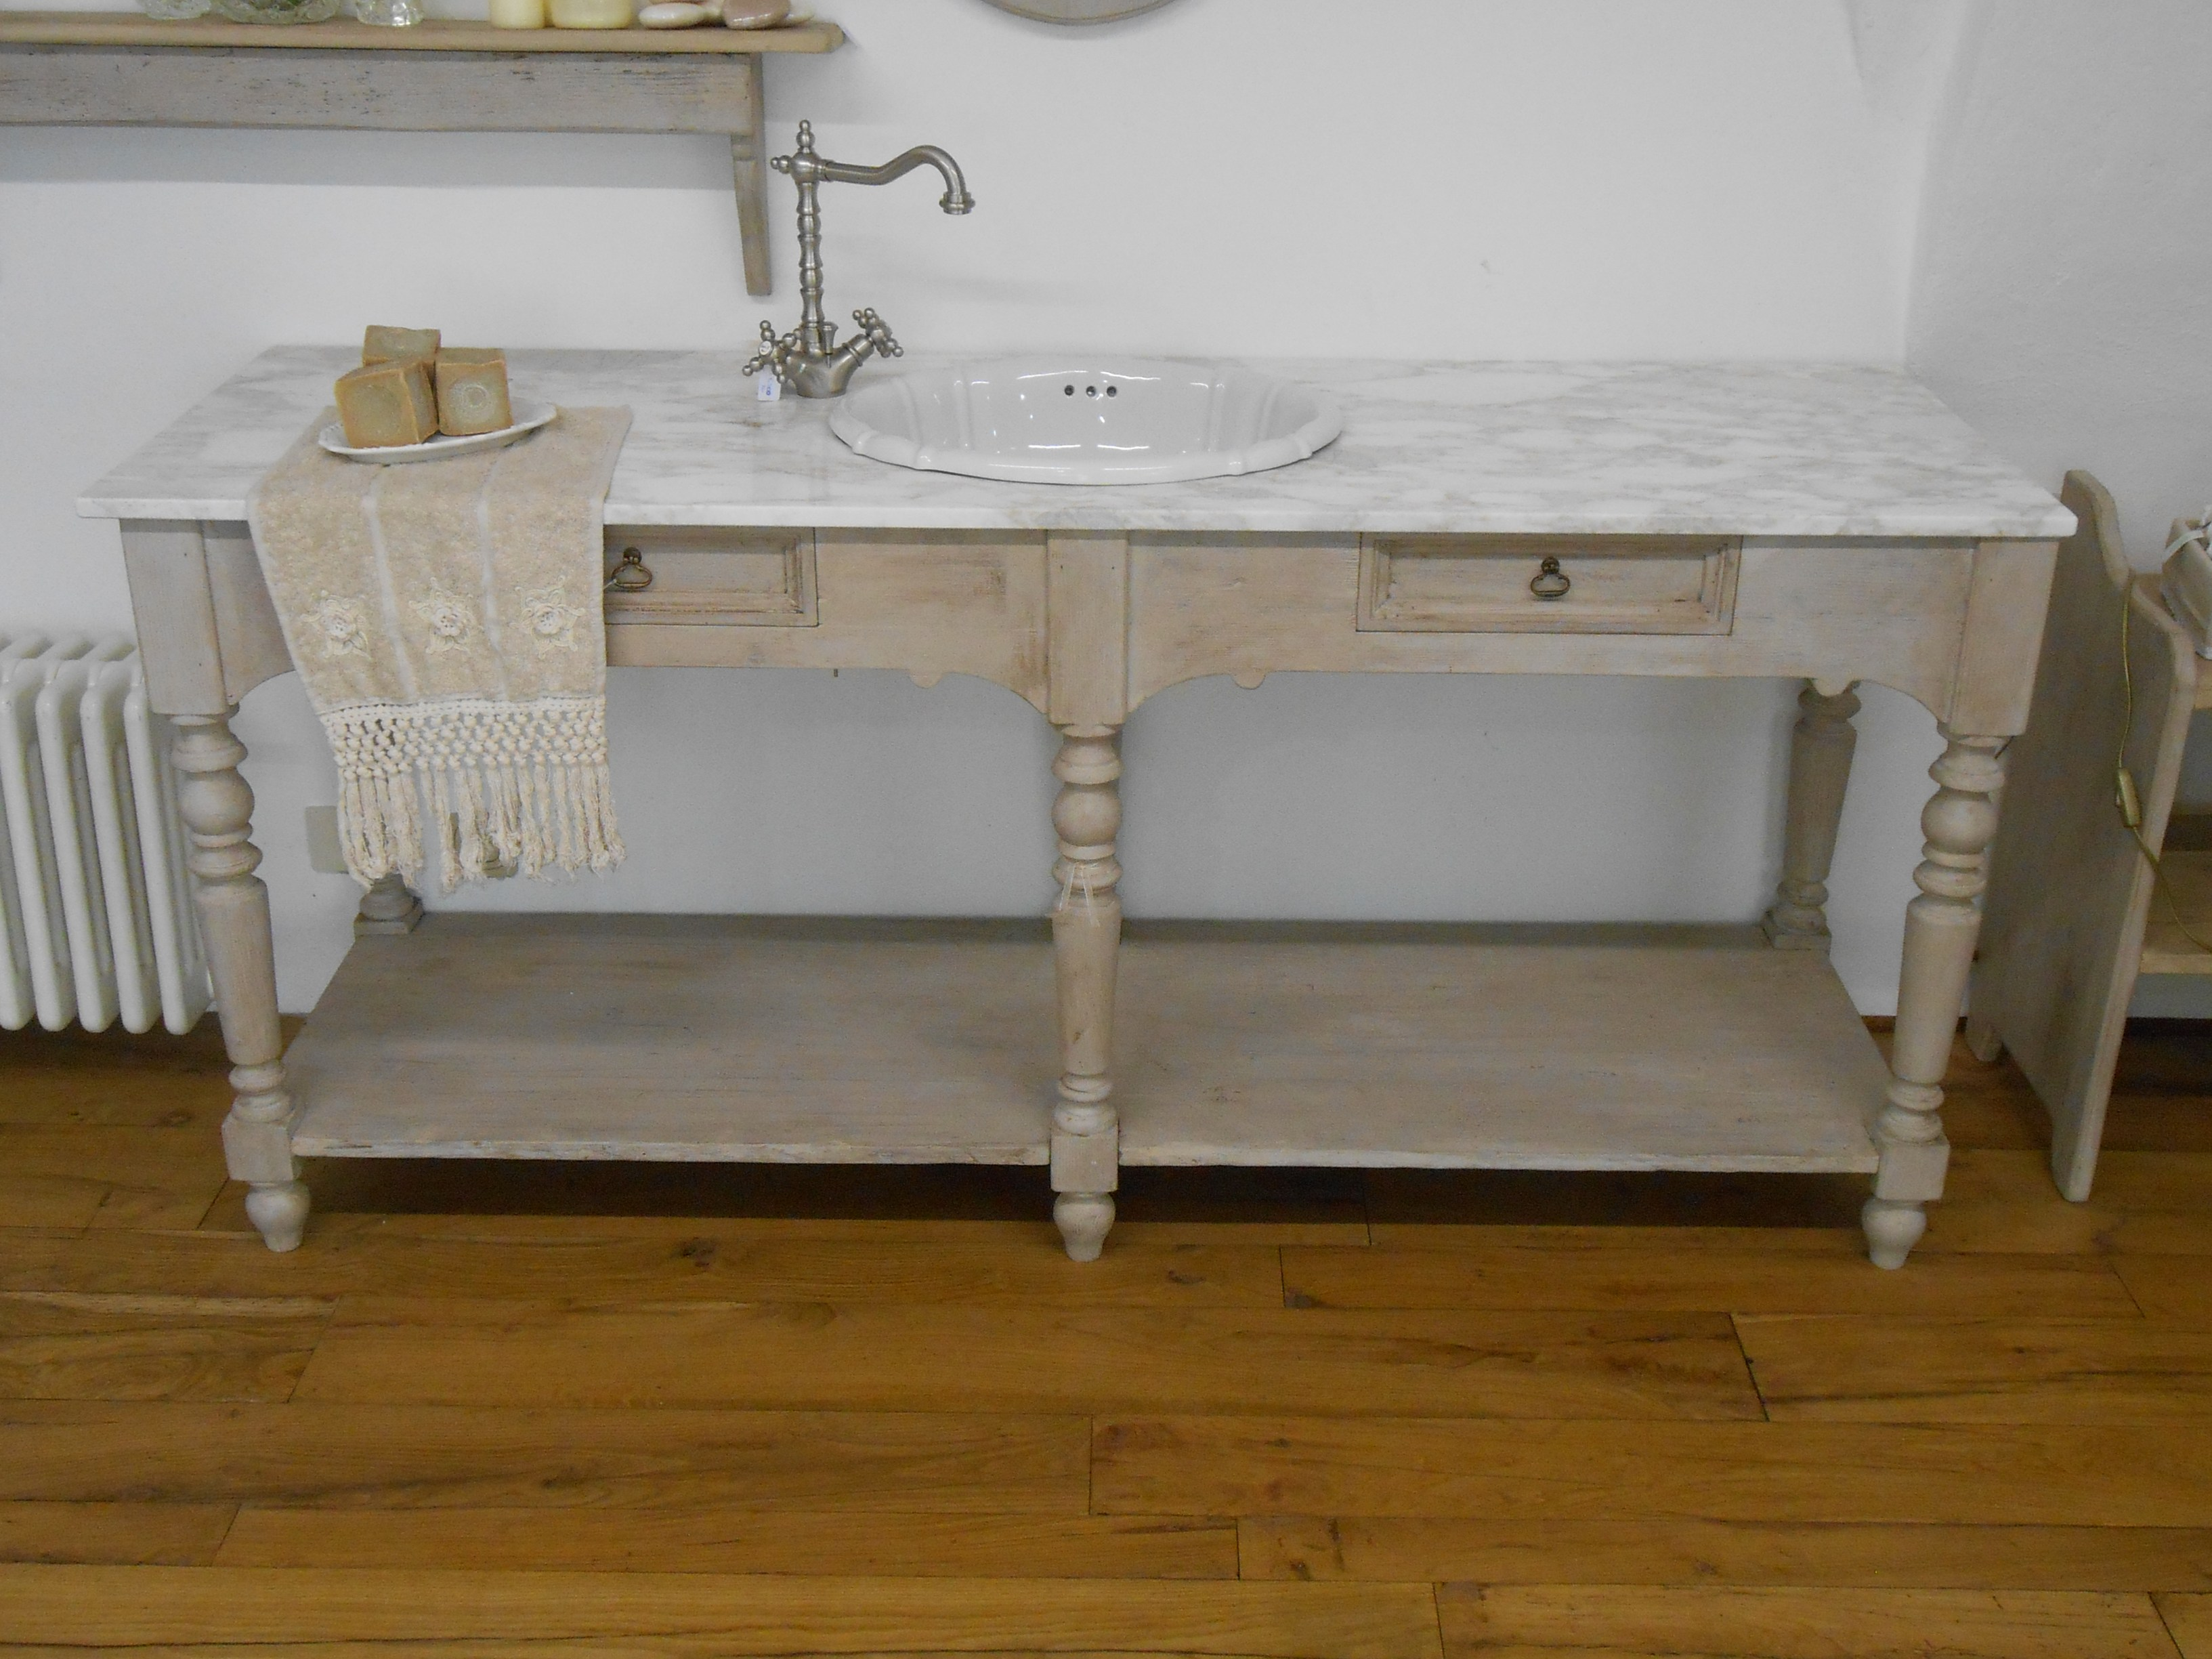 mueble lavabo tradicional mueble bajo lavabo de madera basilic mueble bajo lavabo bleu